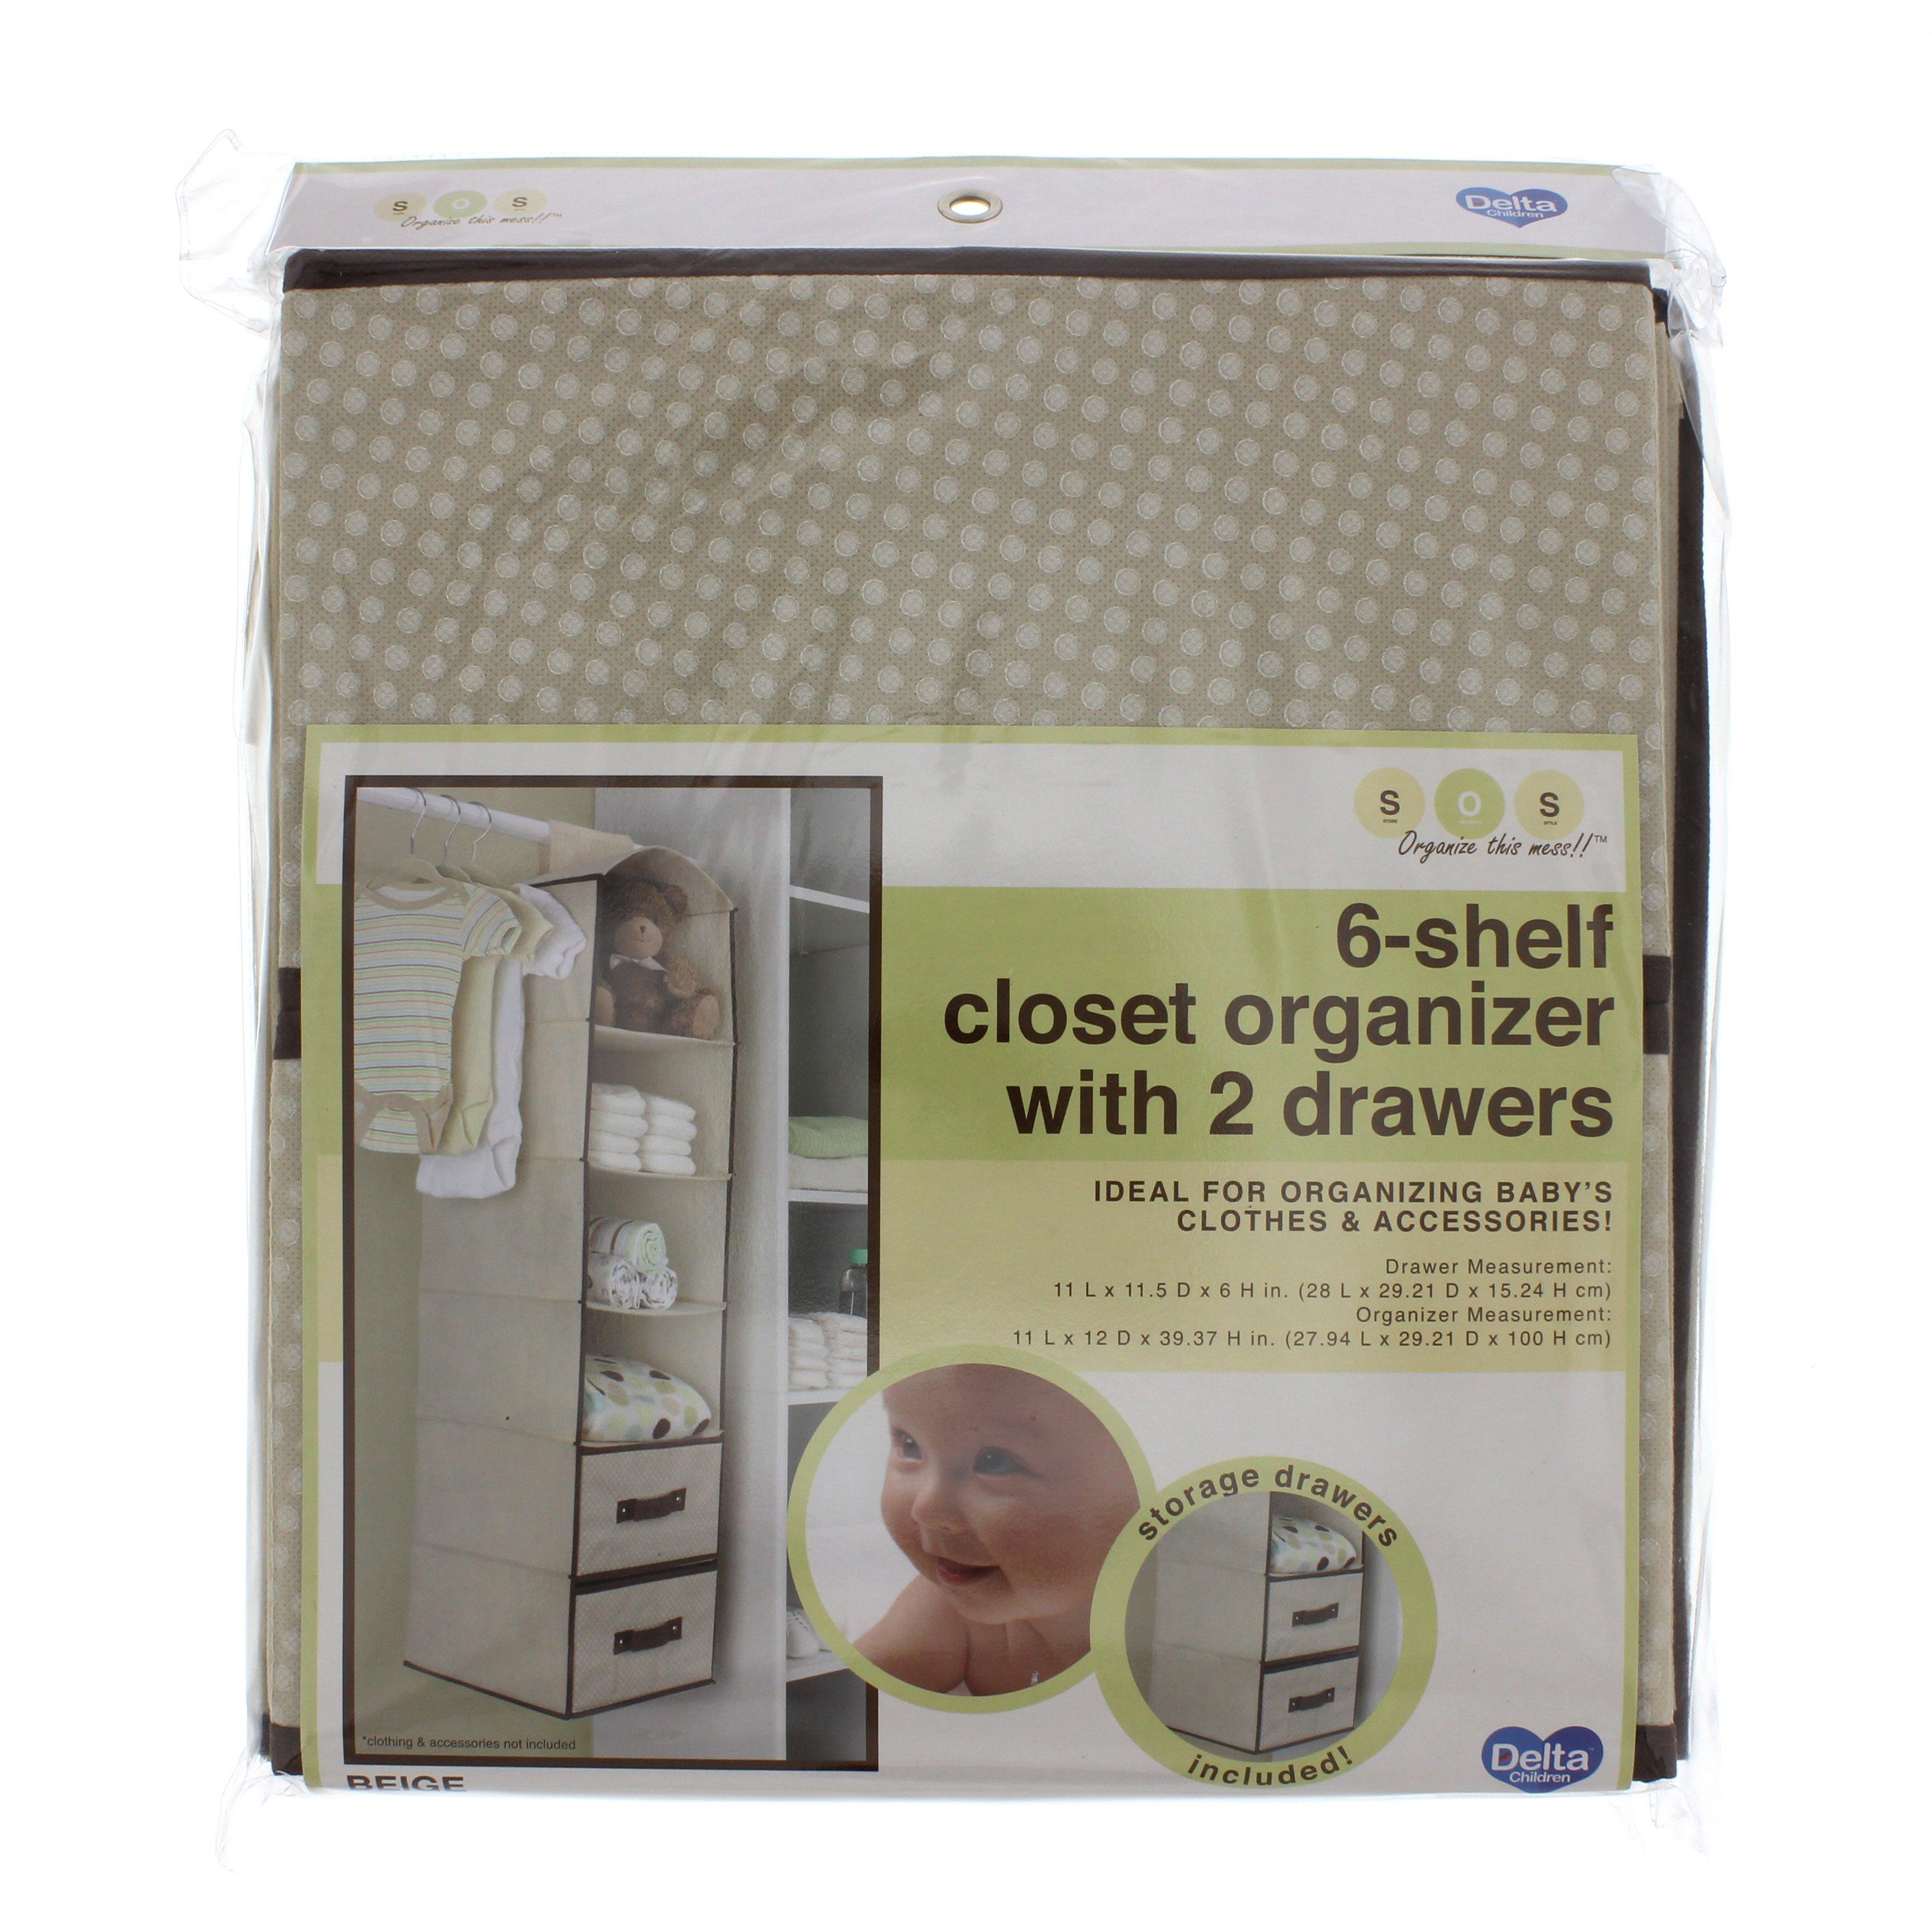 Charmant Delta Children 6 Shelf Closet Organizer With 2 Drawers   Shop Nursery  Accessories At HEB